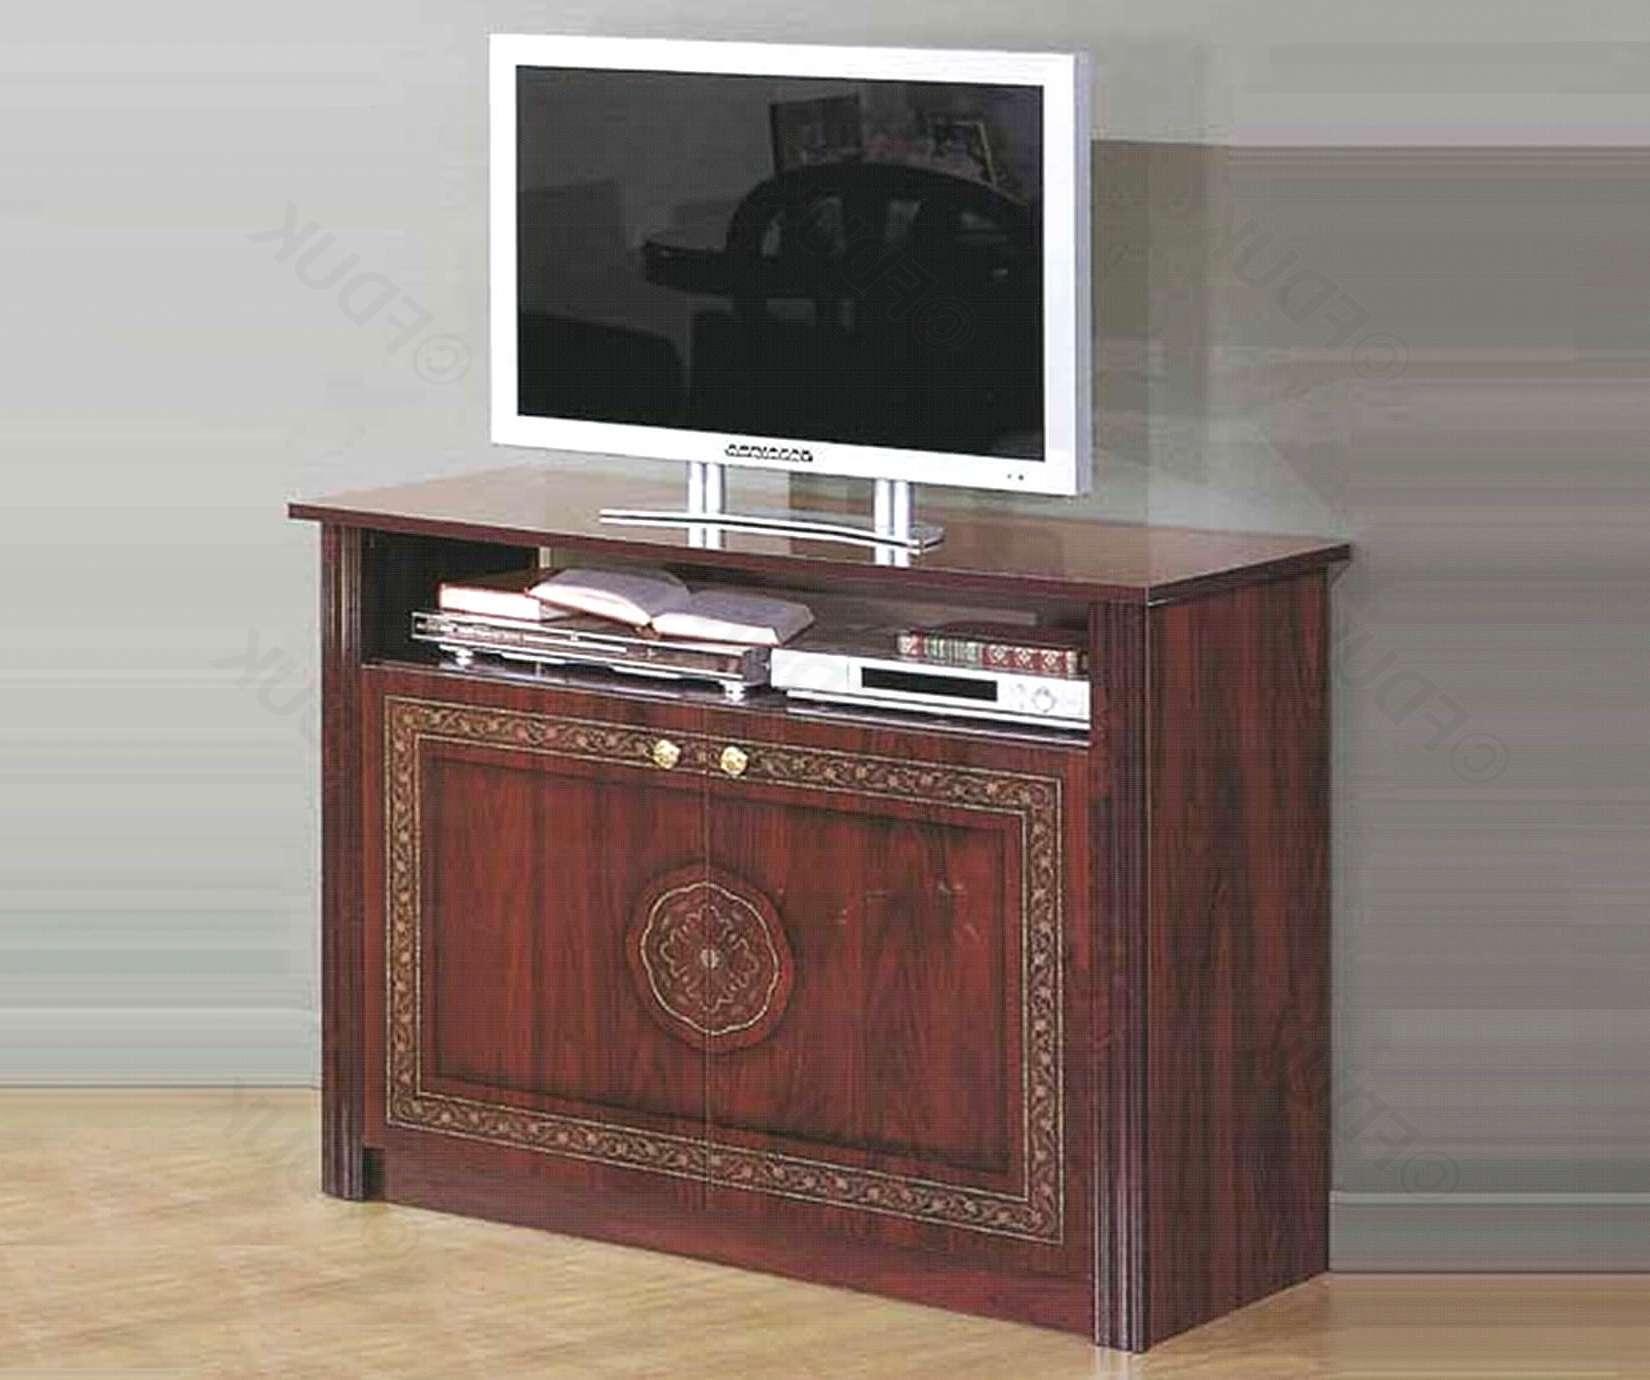 Mcs Pamela | Pamela Mahogany Tv Cabinet | Furnituredirectuk With Regard To Mahogany Tv Cabinets (View 19 of 20)